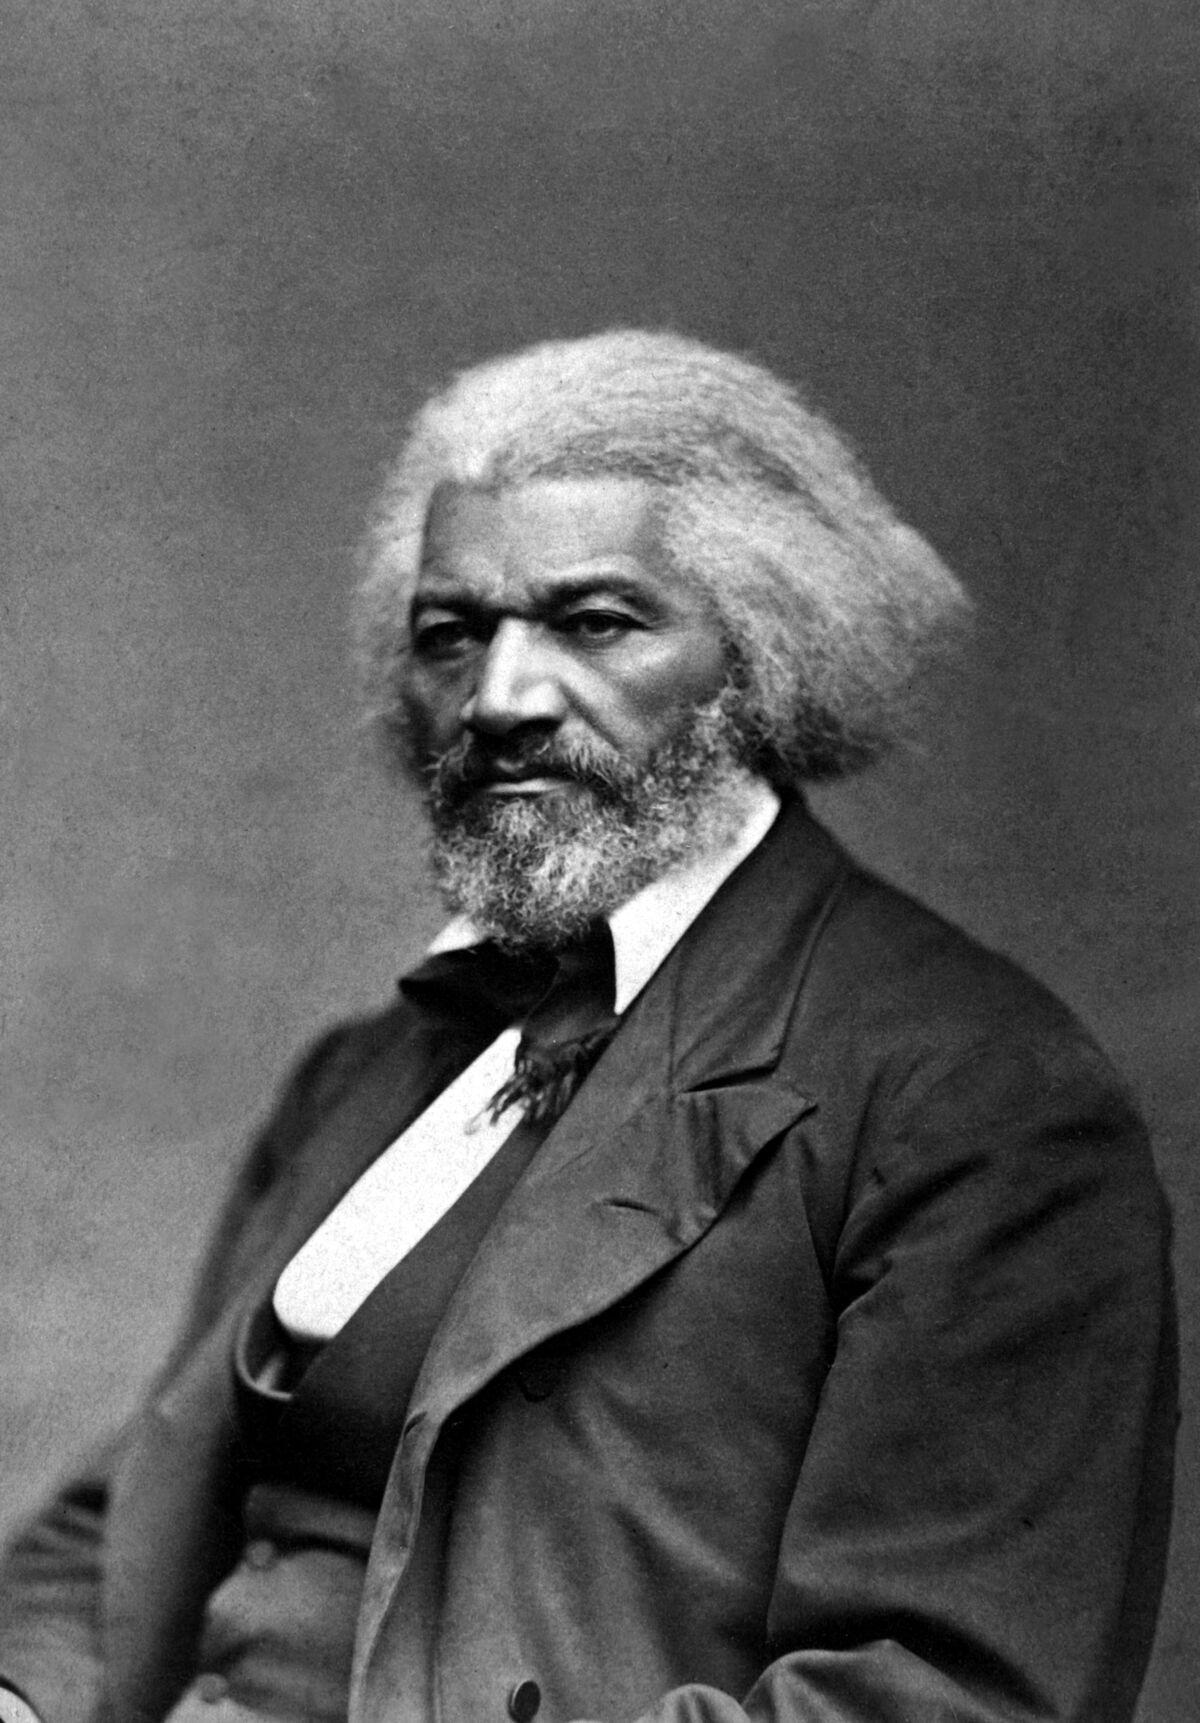 Frederick Douglass, circa 1879. Image via Wikimedia Commons.